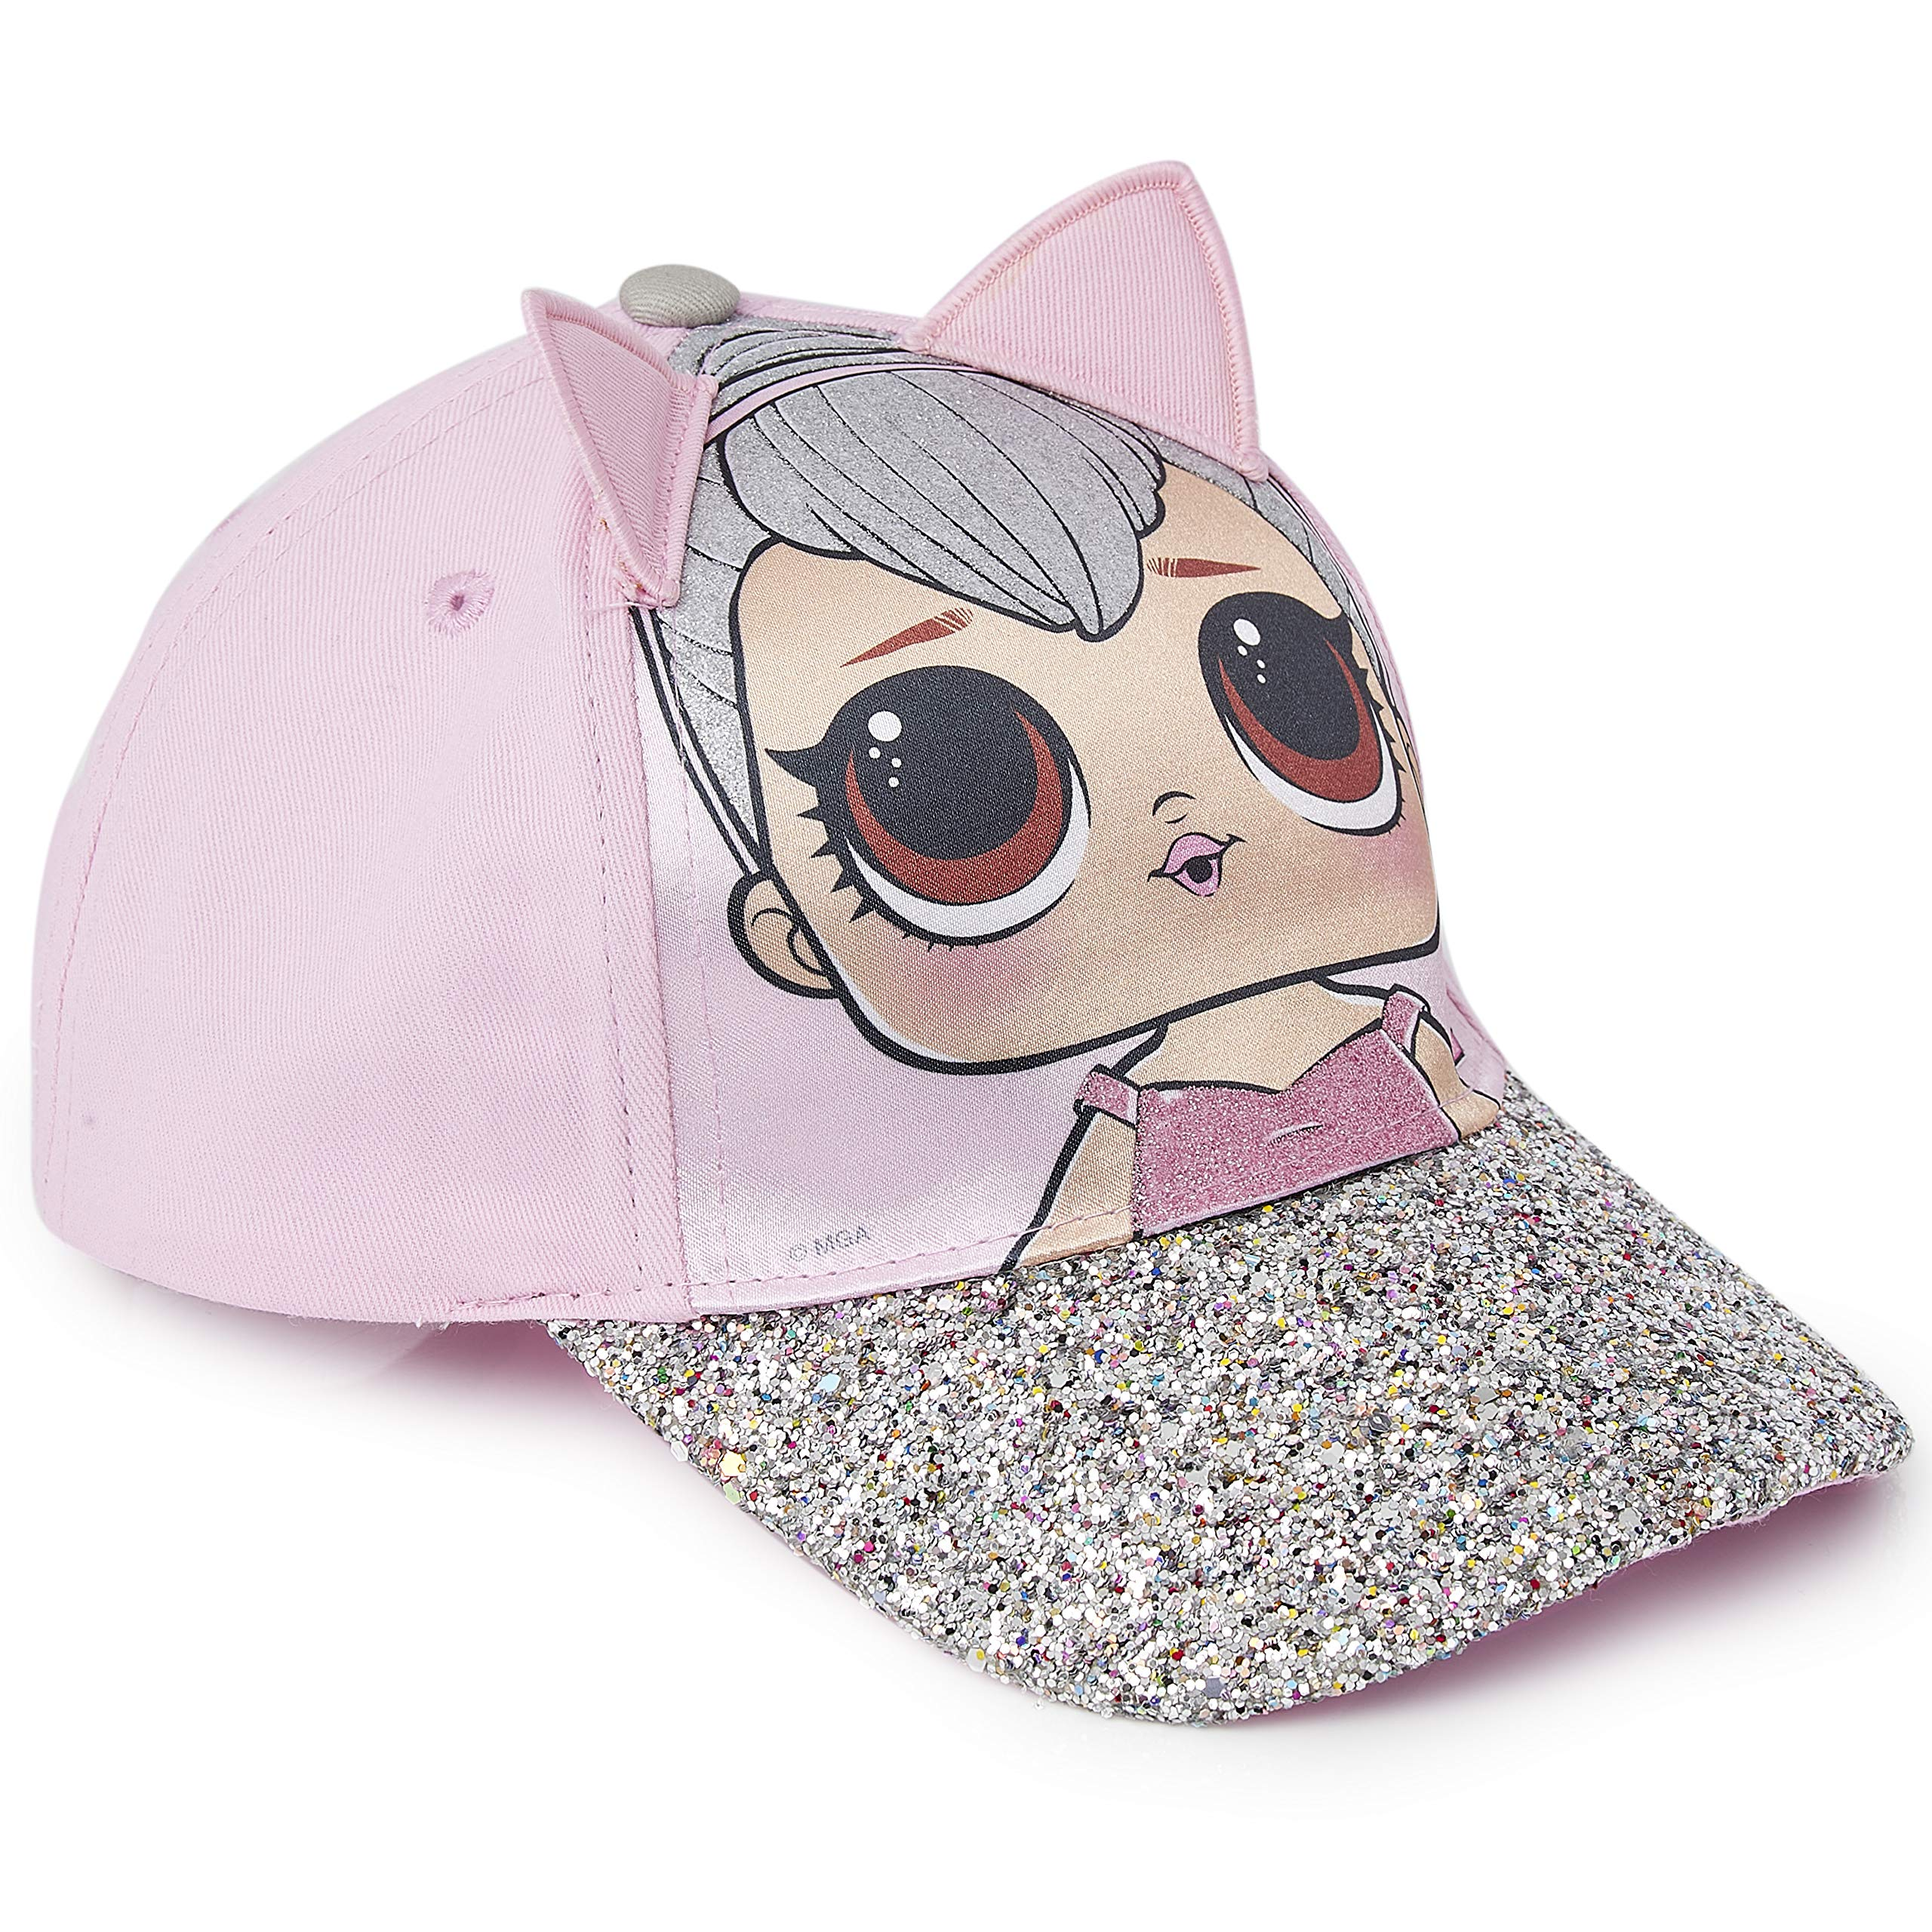 52cm LOL L.O.L SURPRISE Licensed Girl bucket brim hat pink NEW sz 50cm